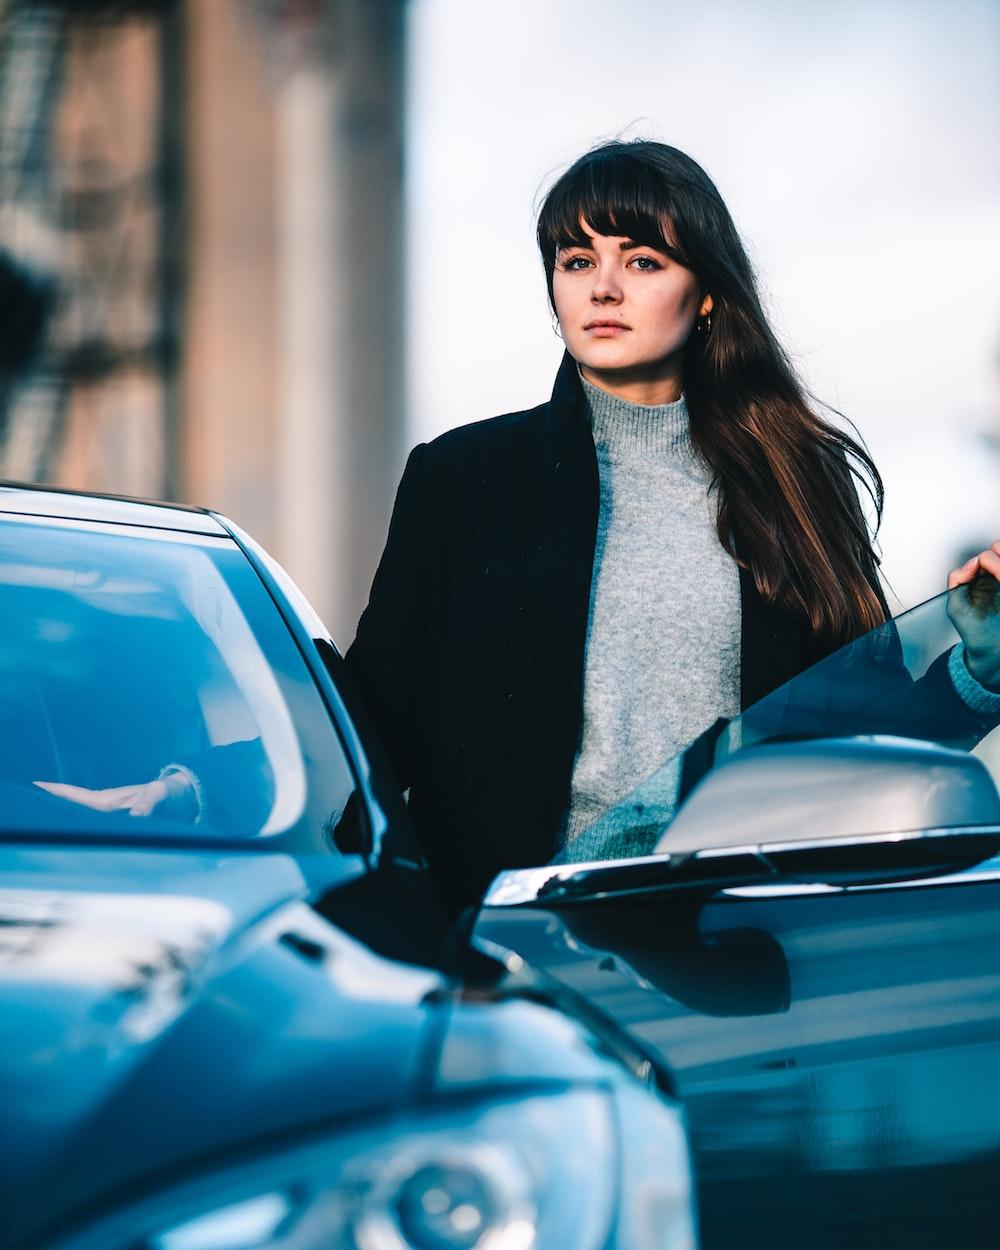 woman standing beside vehicle